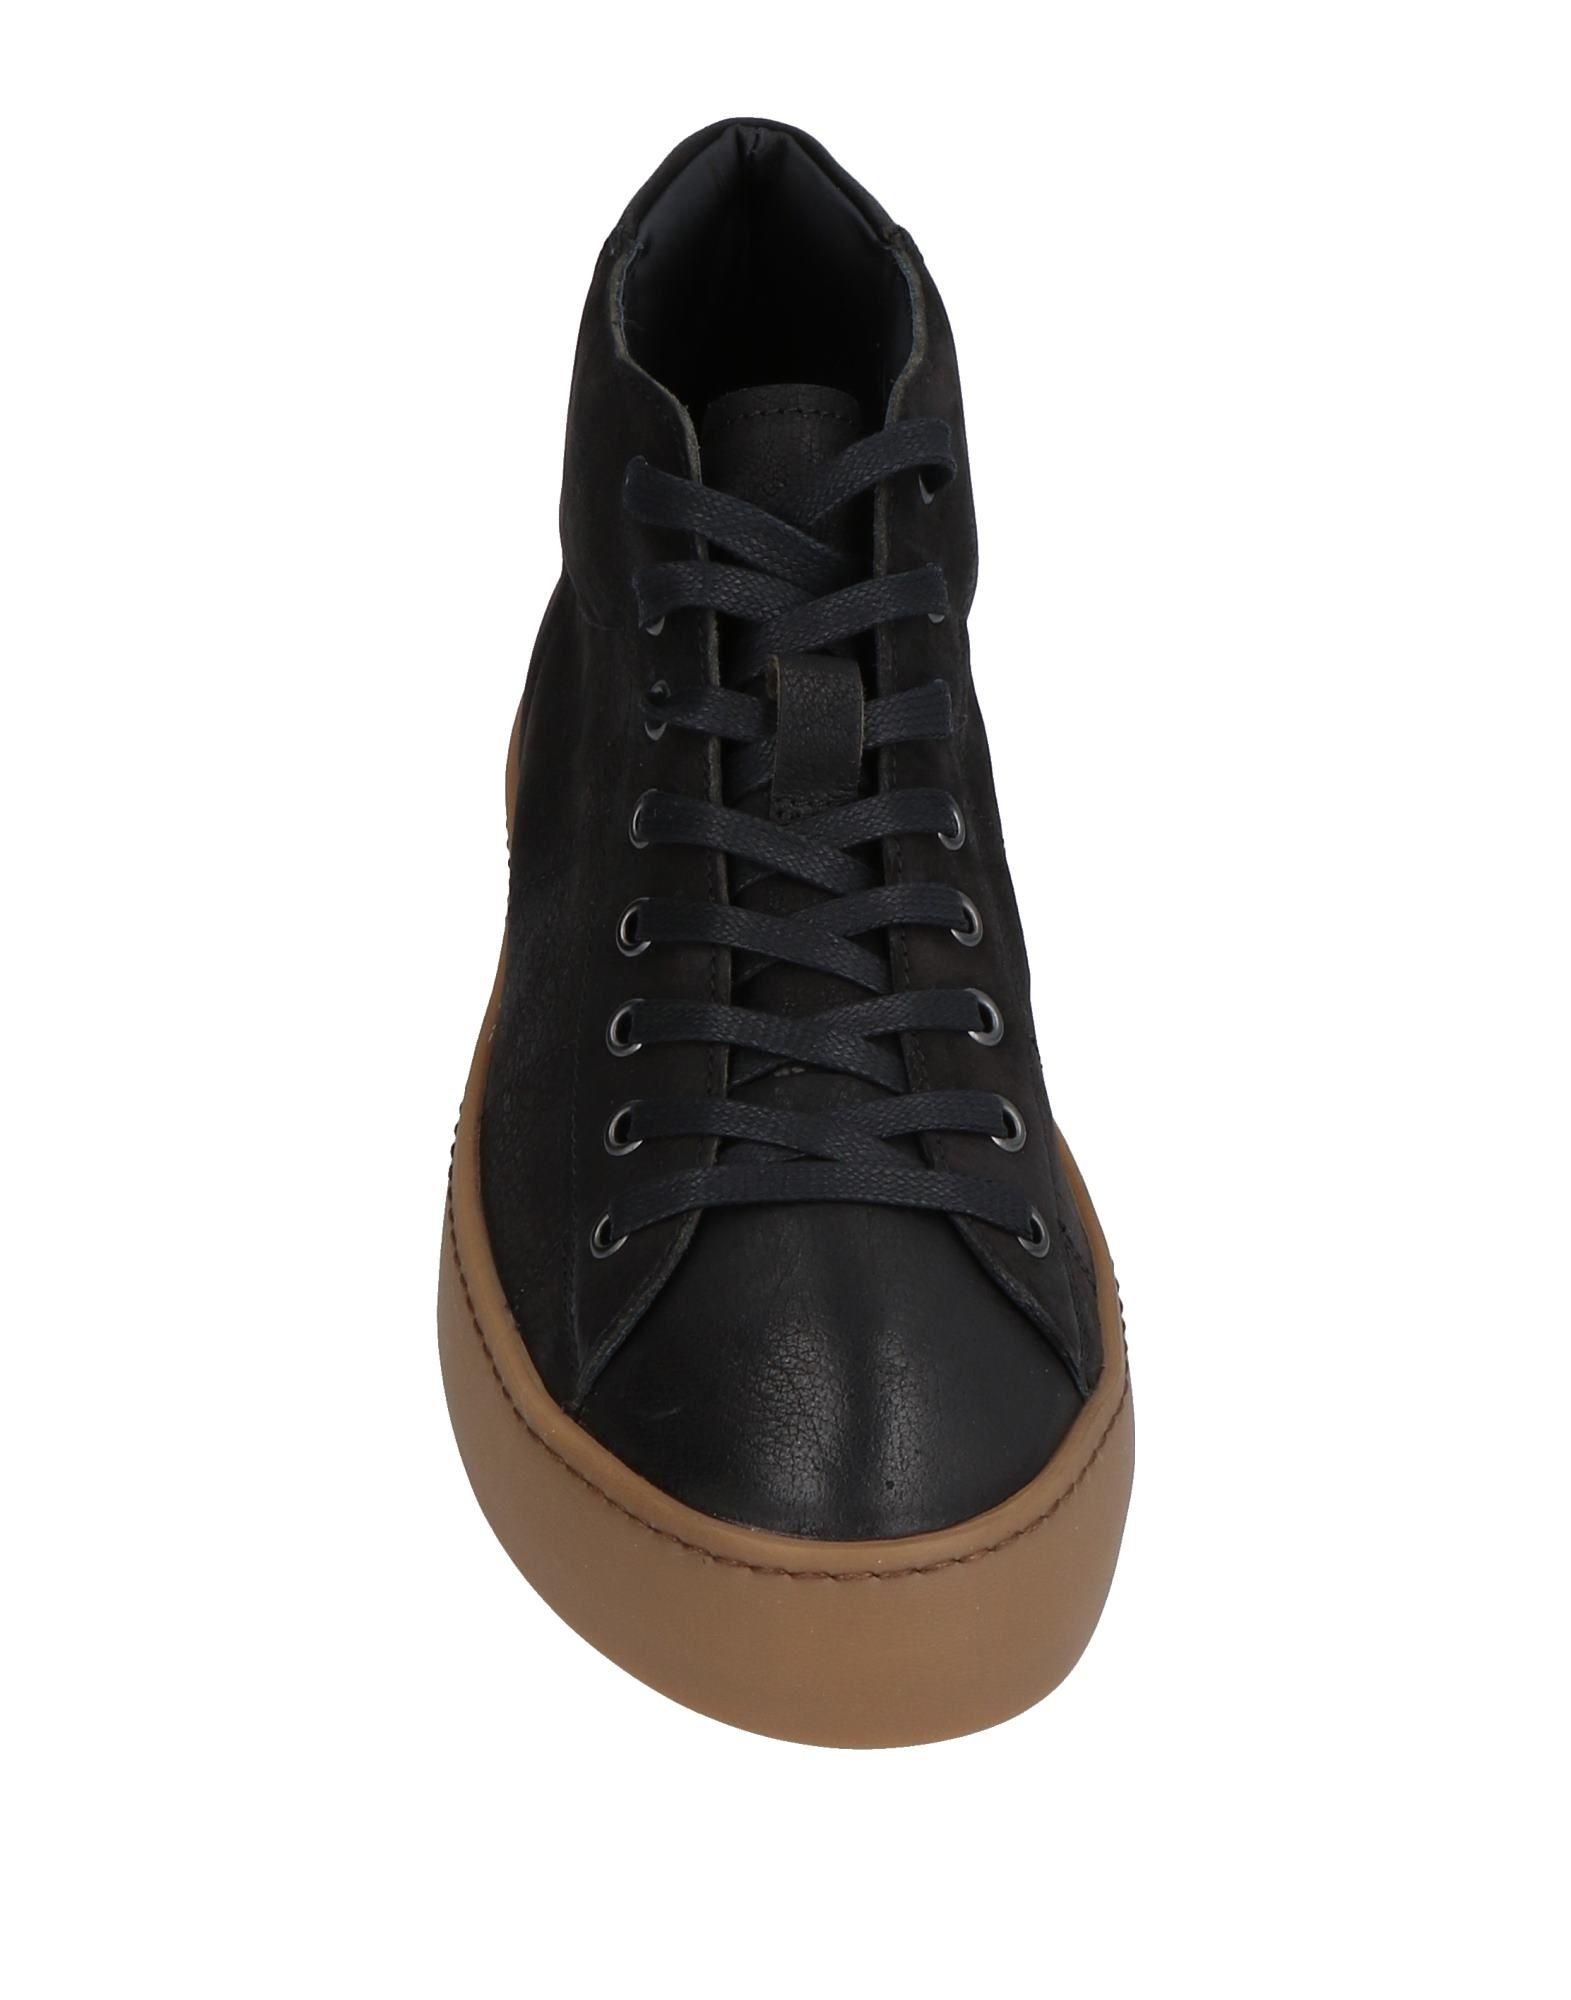 Cappelletti Sneakers Herren    11497770DT Heiße Schuhe b72db4